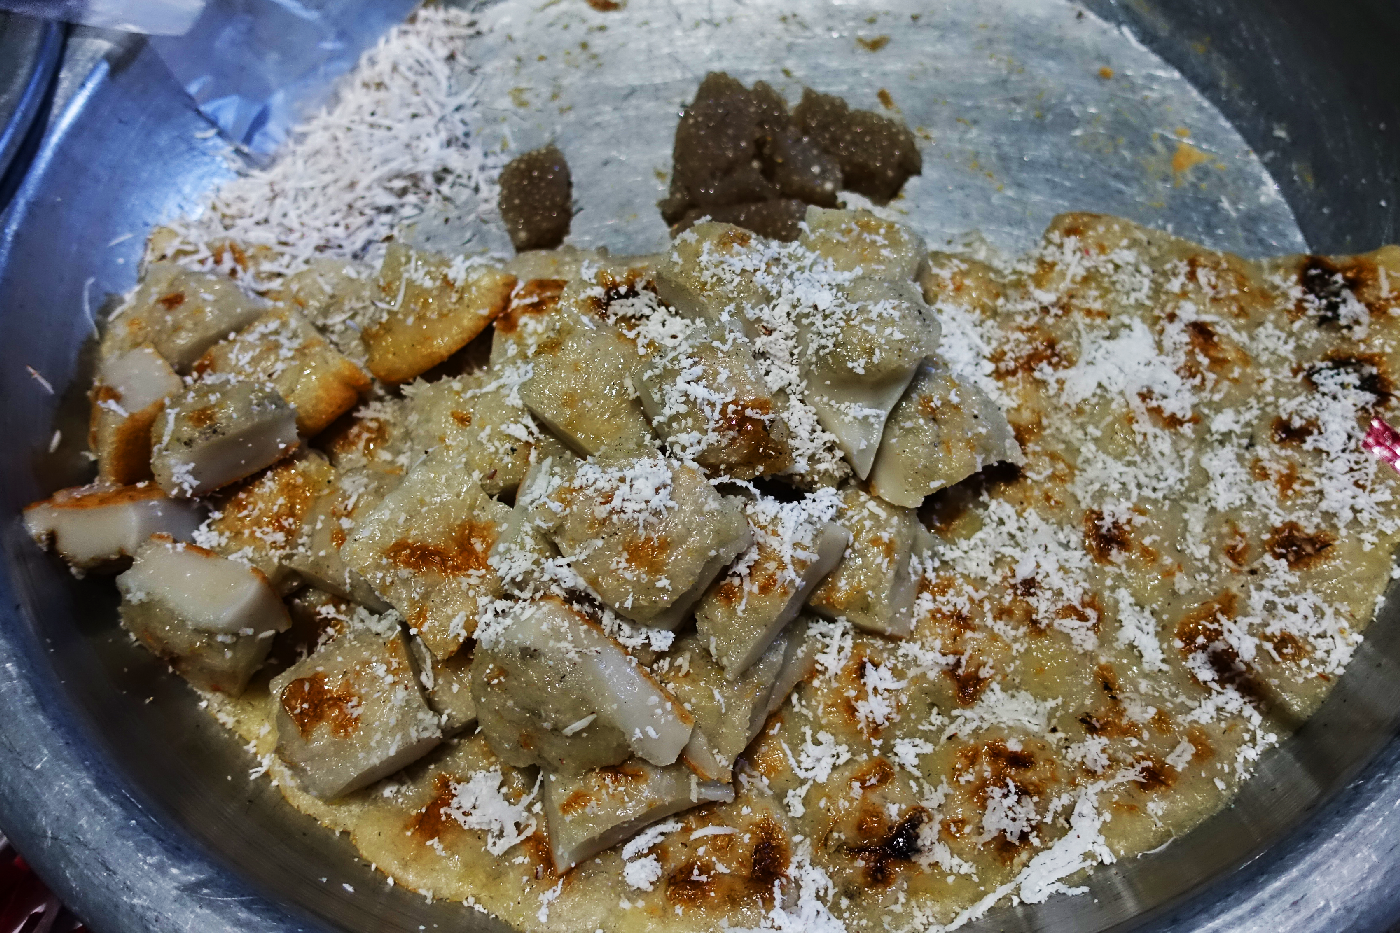 hsipaw night market cakes Myanmar